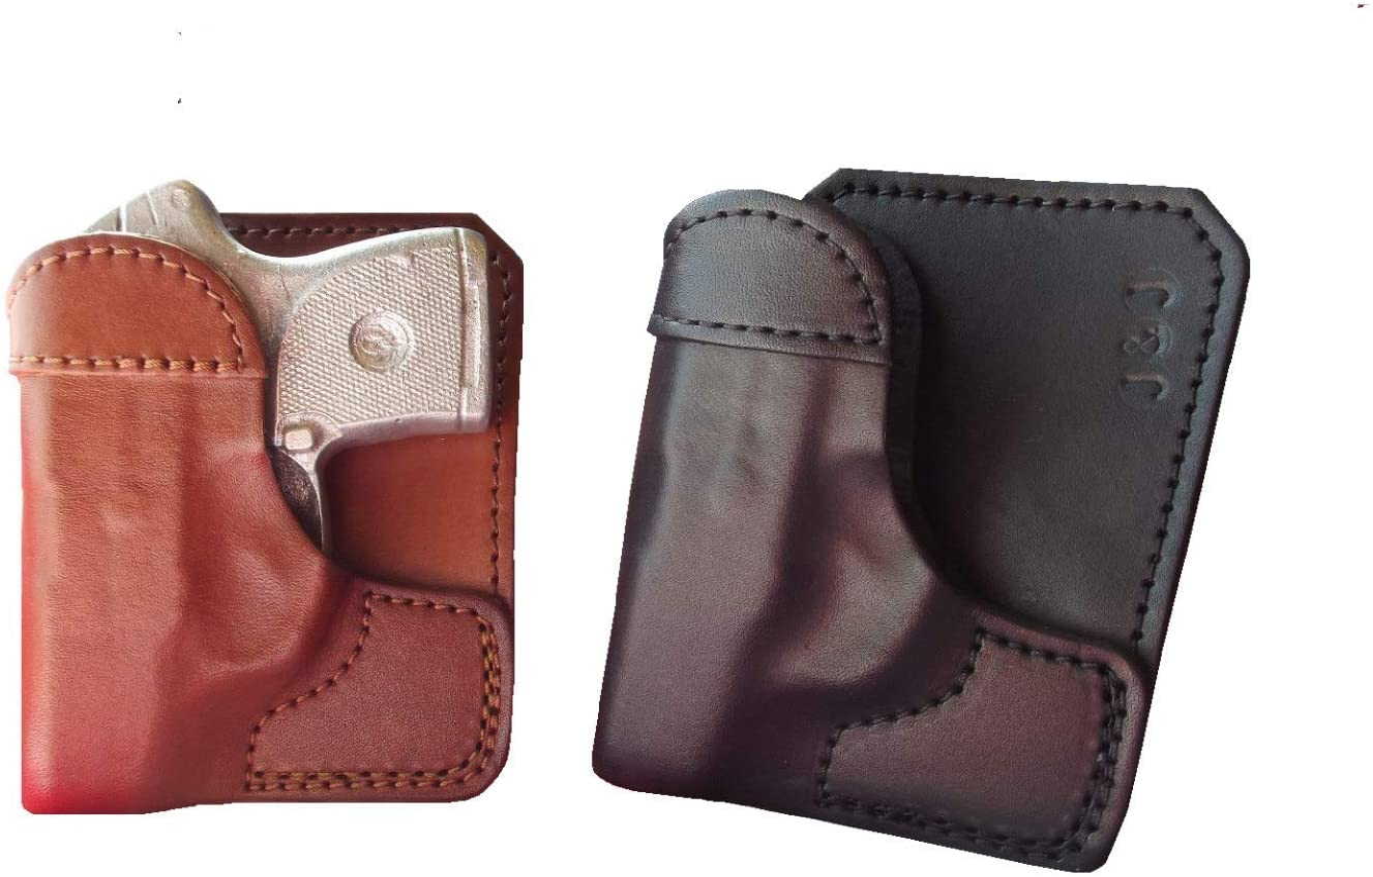 JJ 新作からSALEアイテム等お得な商品 満載 Custom Formed to 安全 Fit Wallet Hellcat Style Springfield